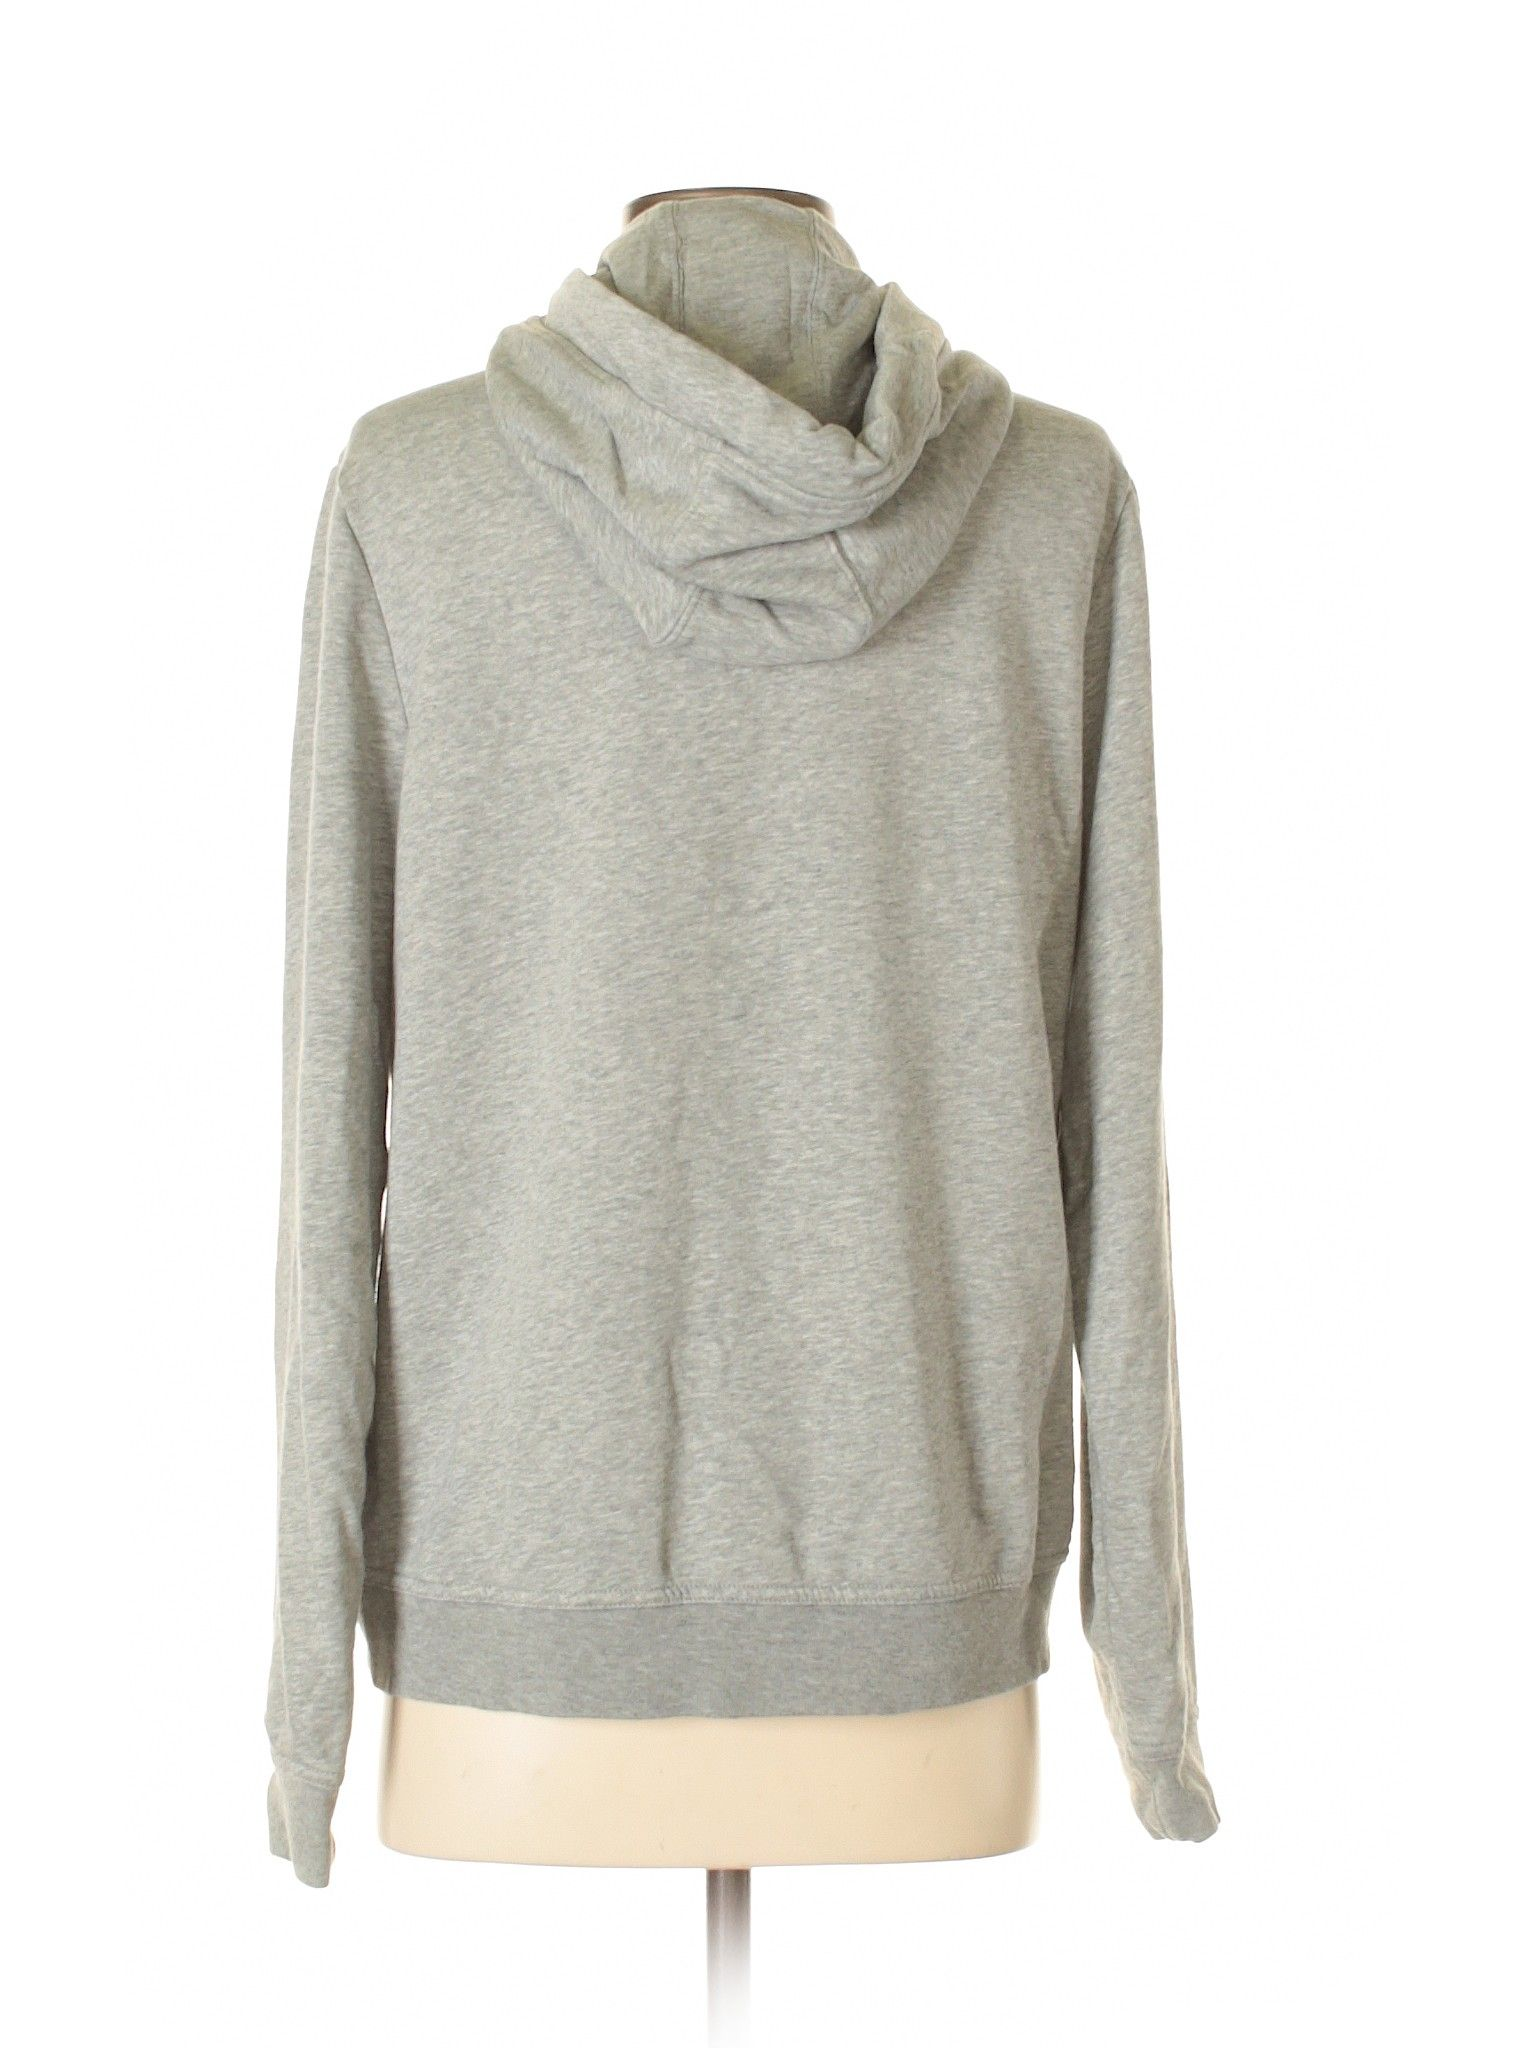 Sweatshirt Nike Sweatshirts Sweatshirts Grey Sweatshirt